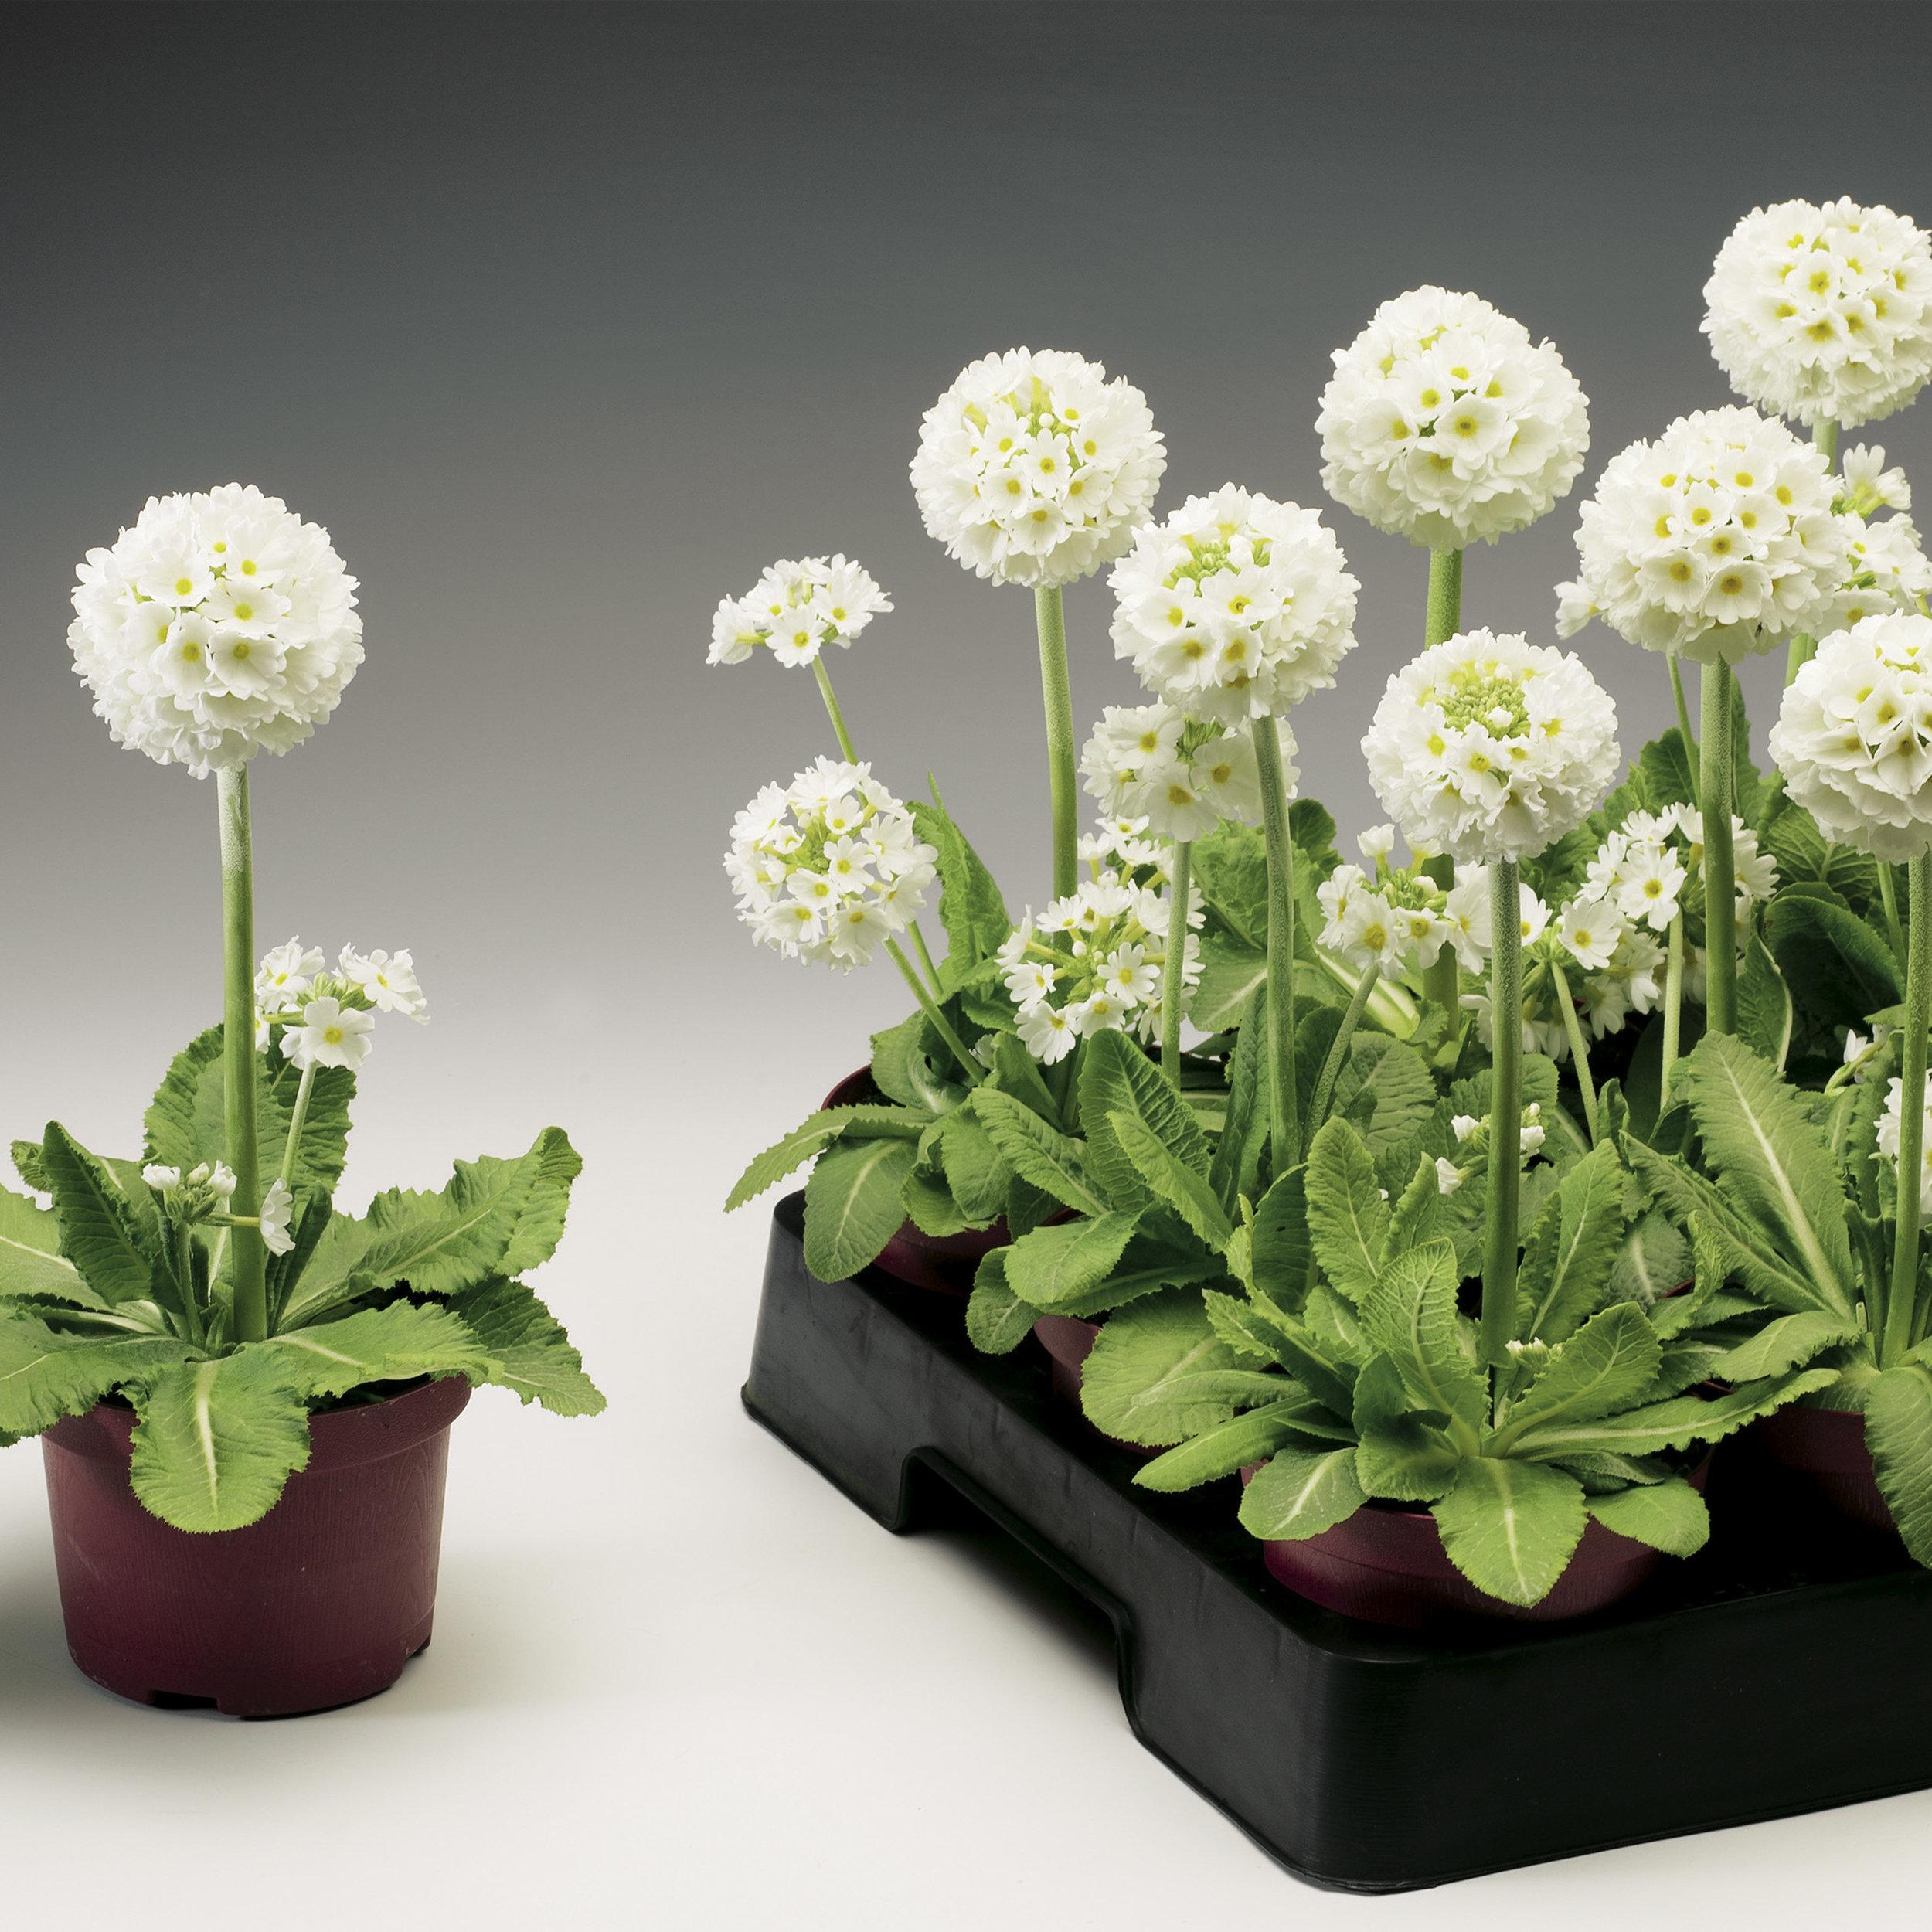 HR_Seed_Primula_Corolla__Corolla__White_70001239_2.jpg